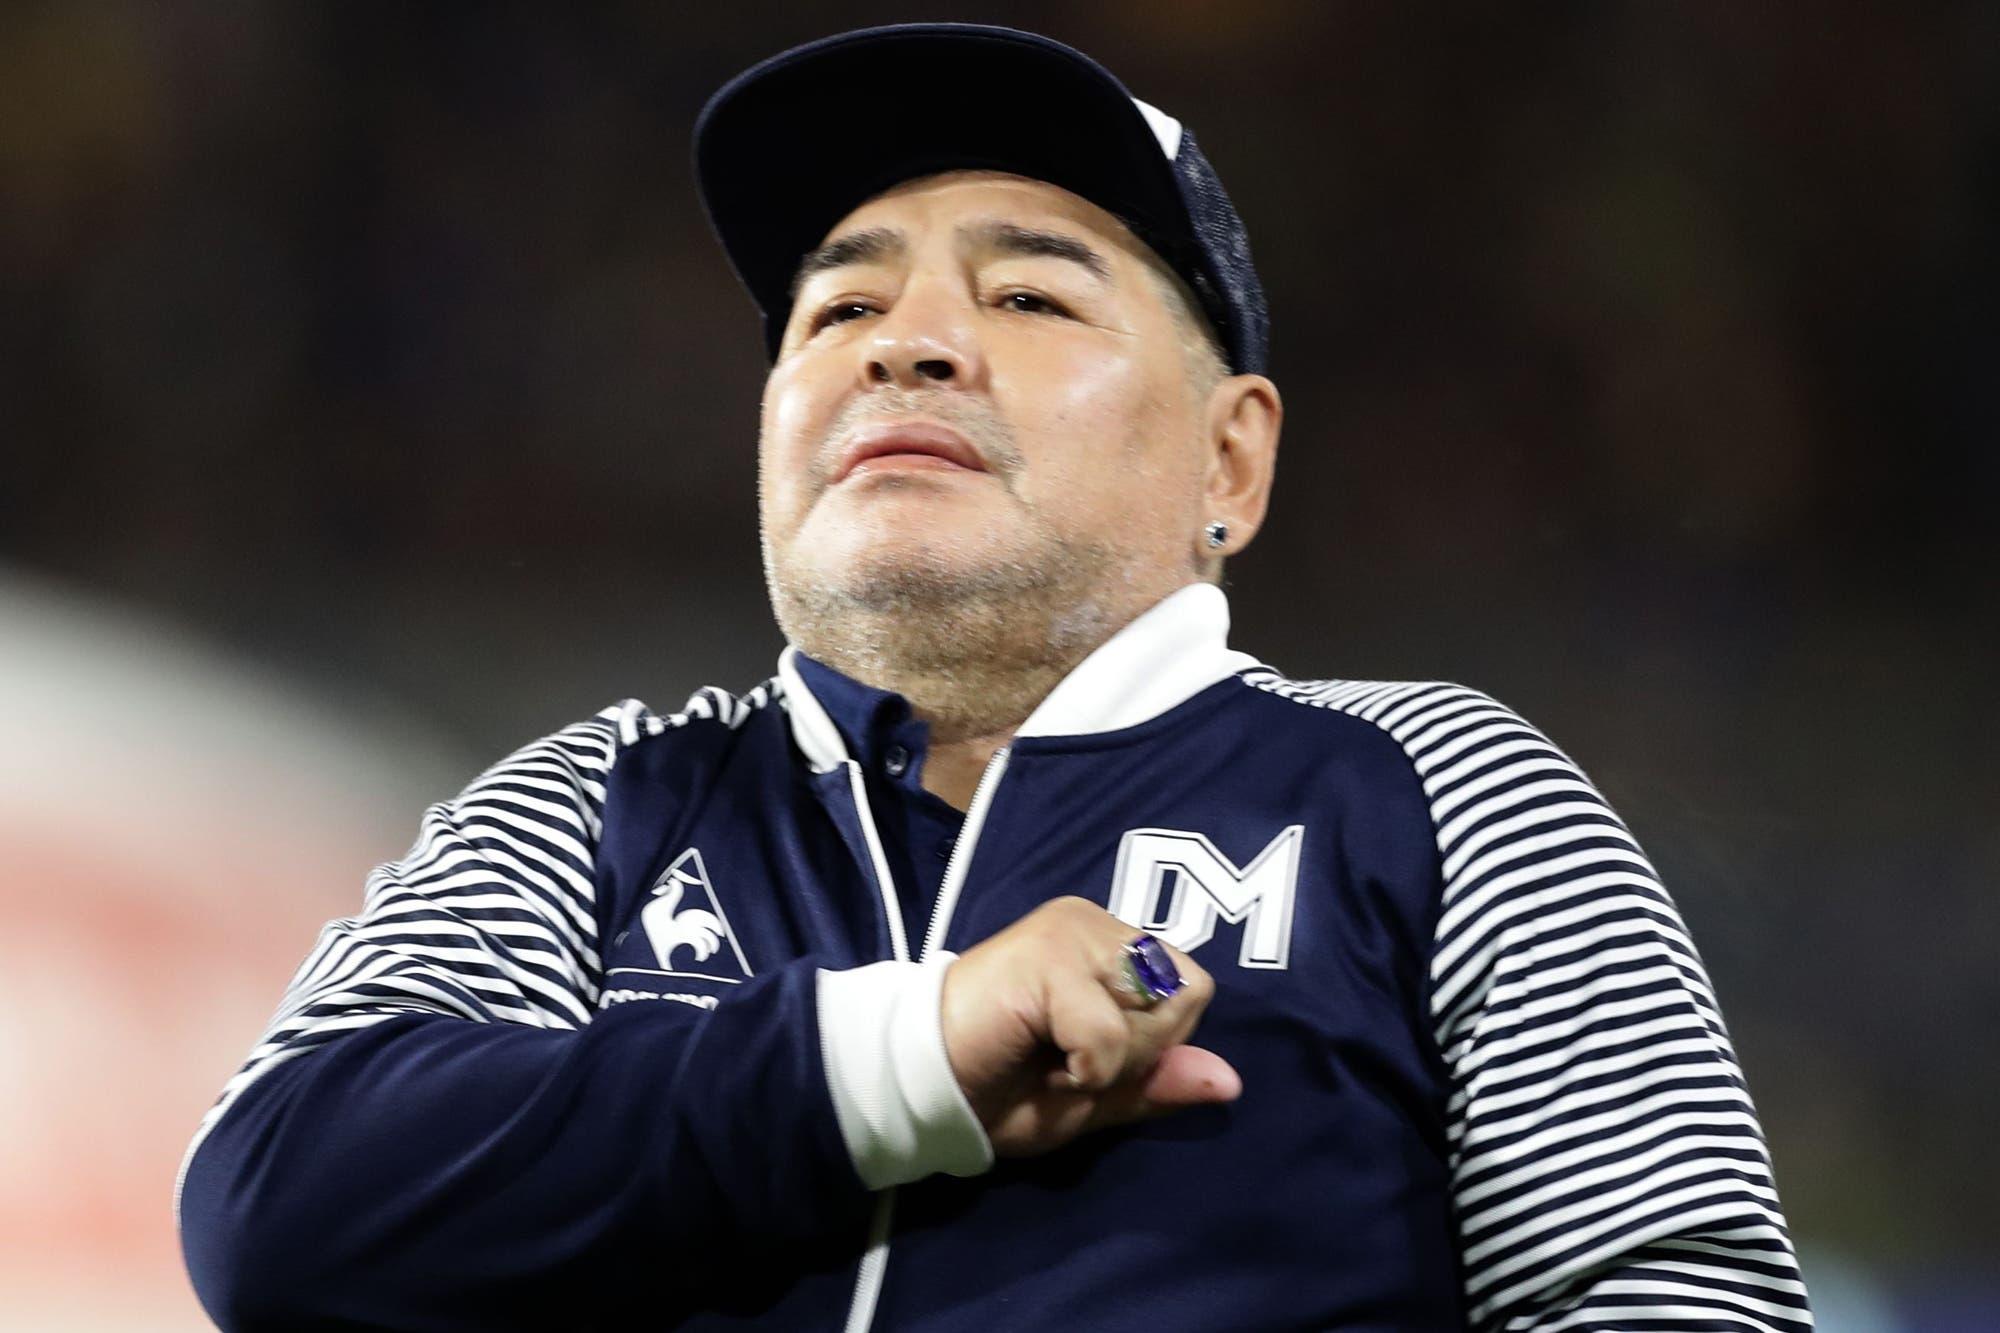 La salud de Maradona